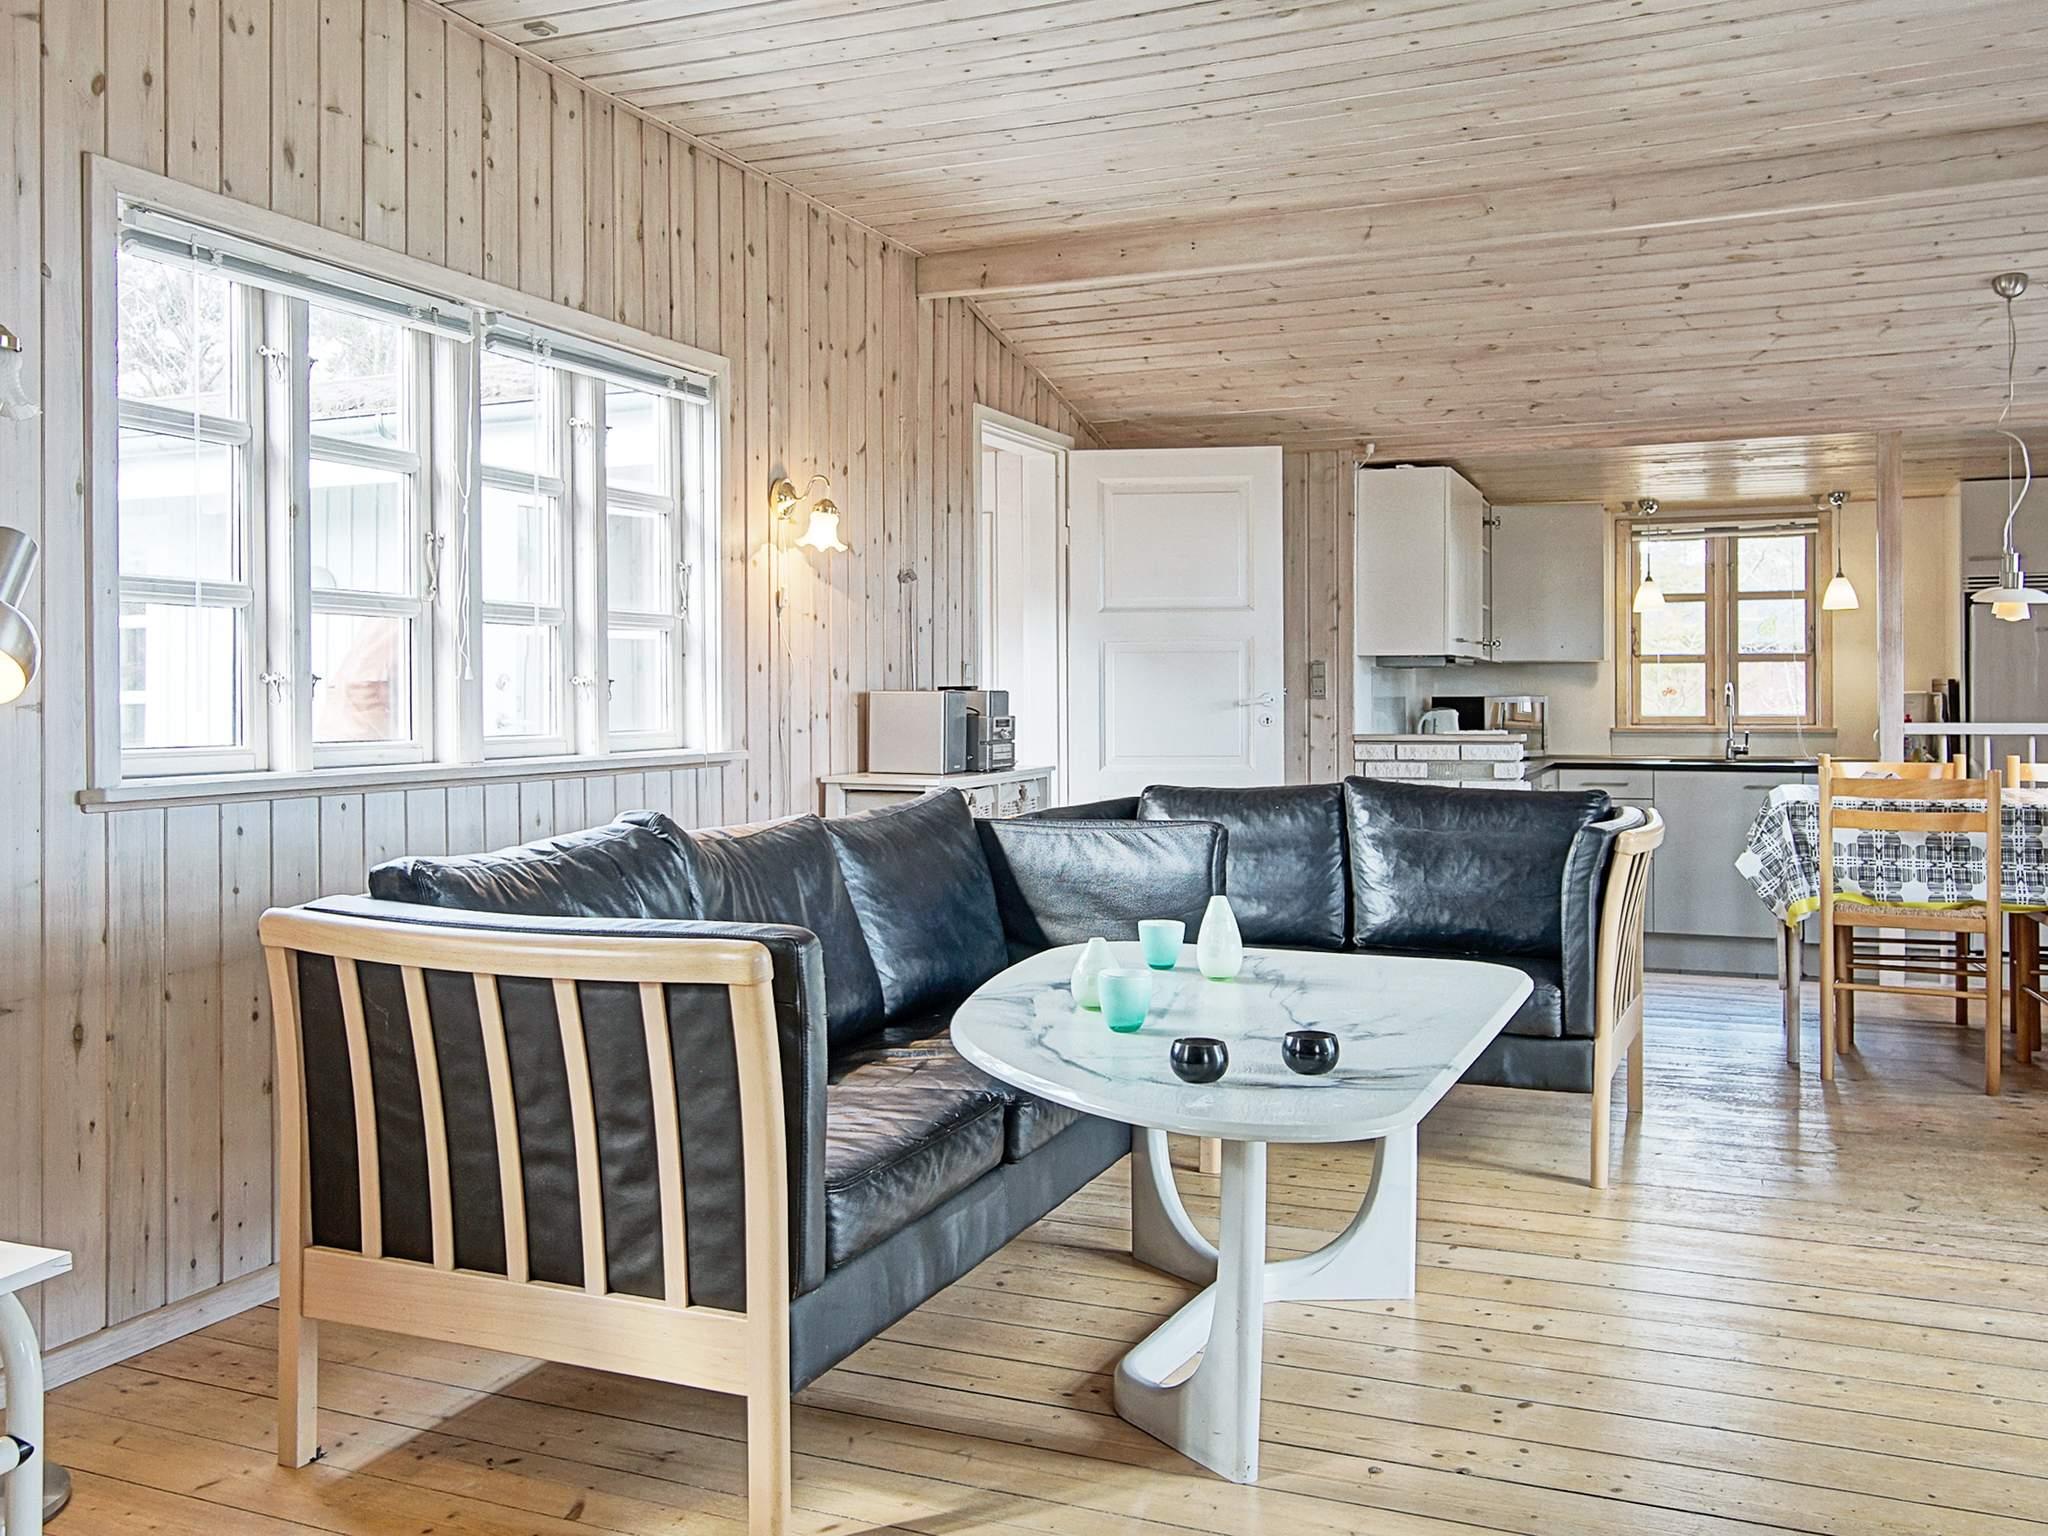 Ferienhaus Balka Strand (493388), Balke, , Bornholm, Dänemark, Bild 10